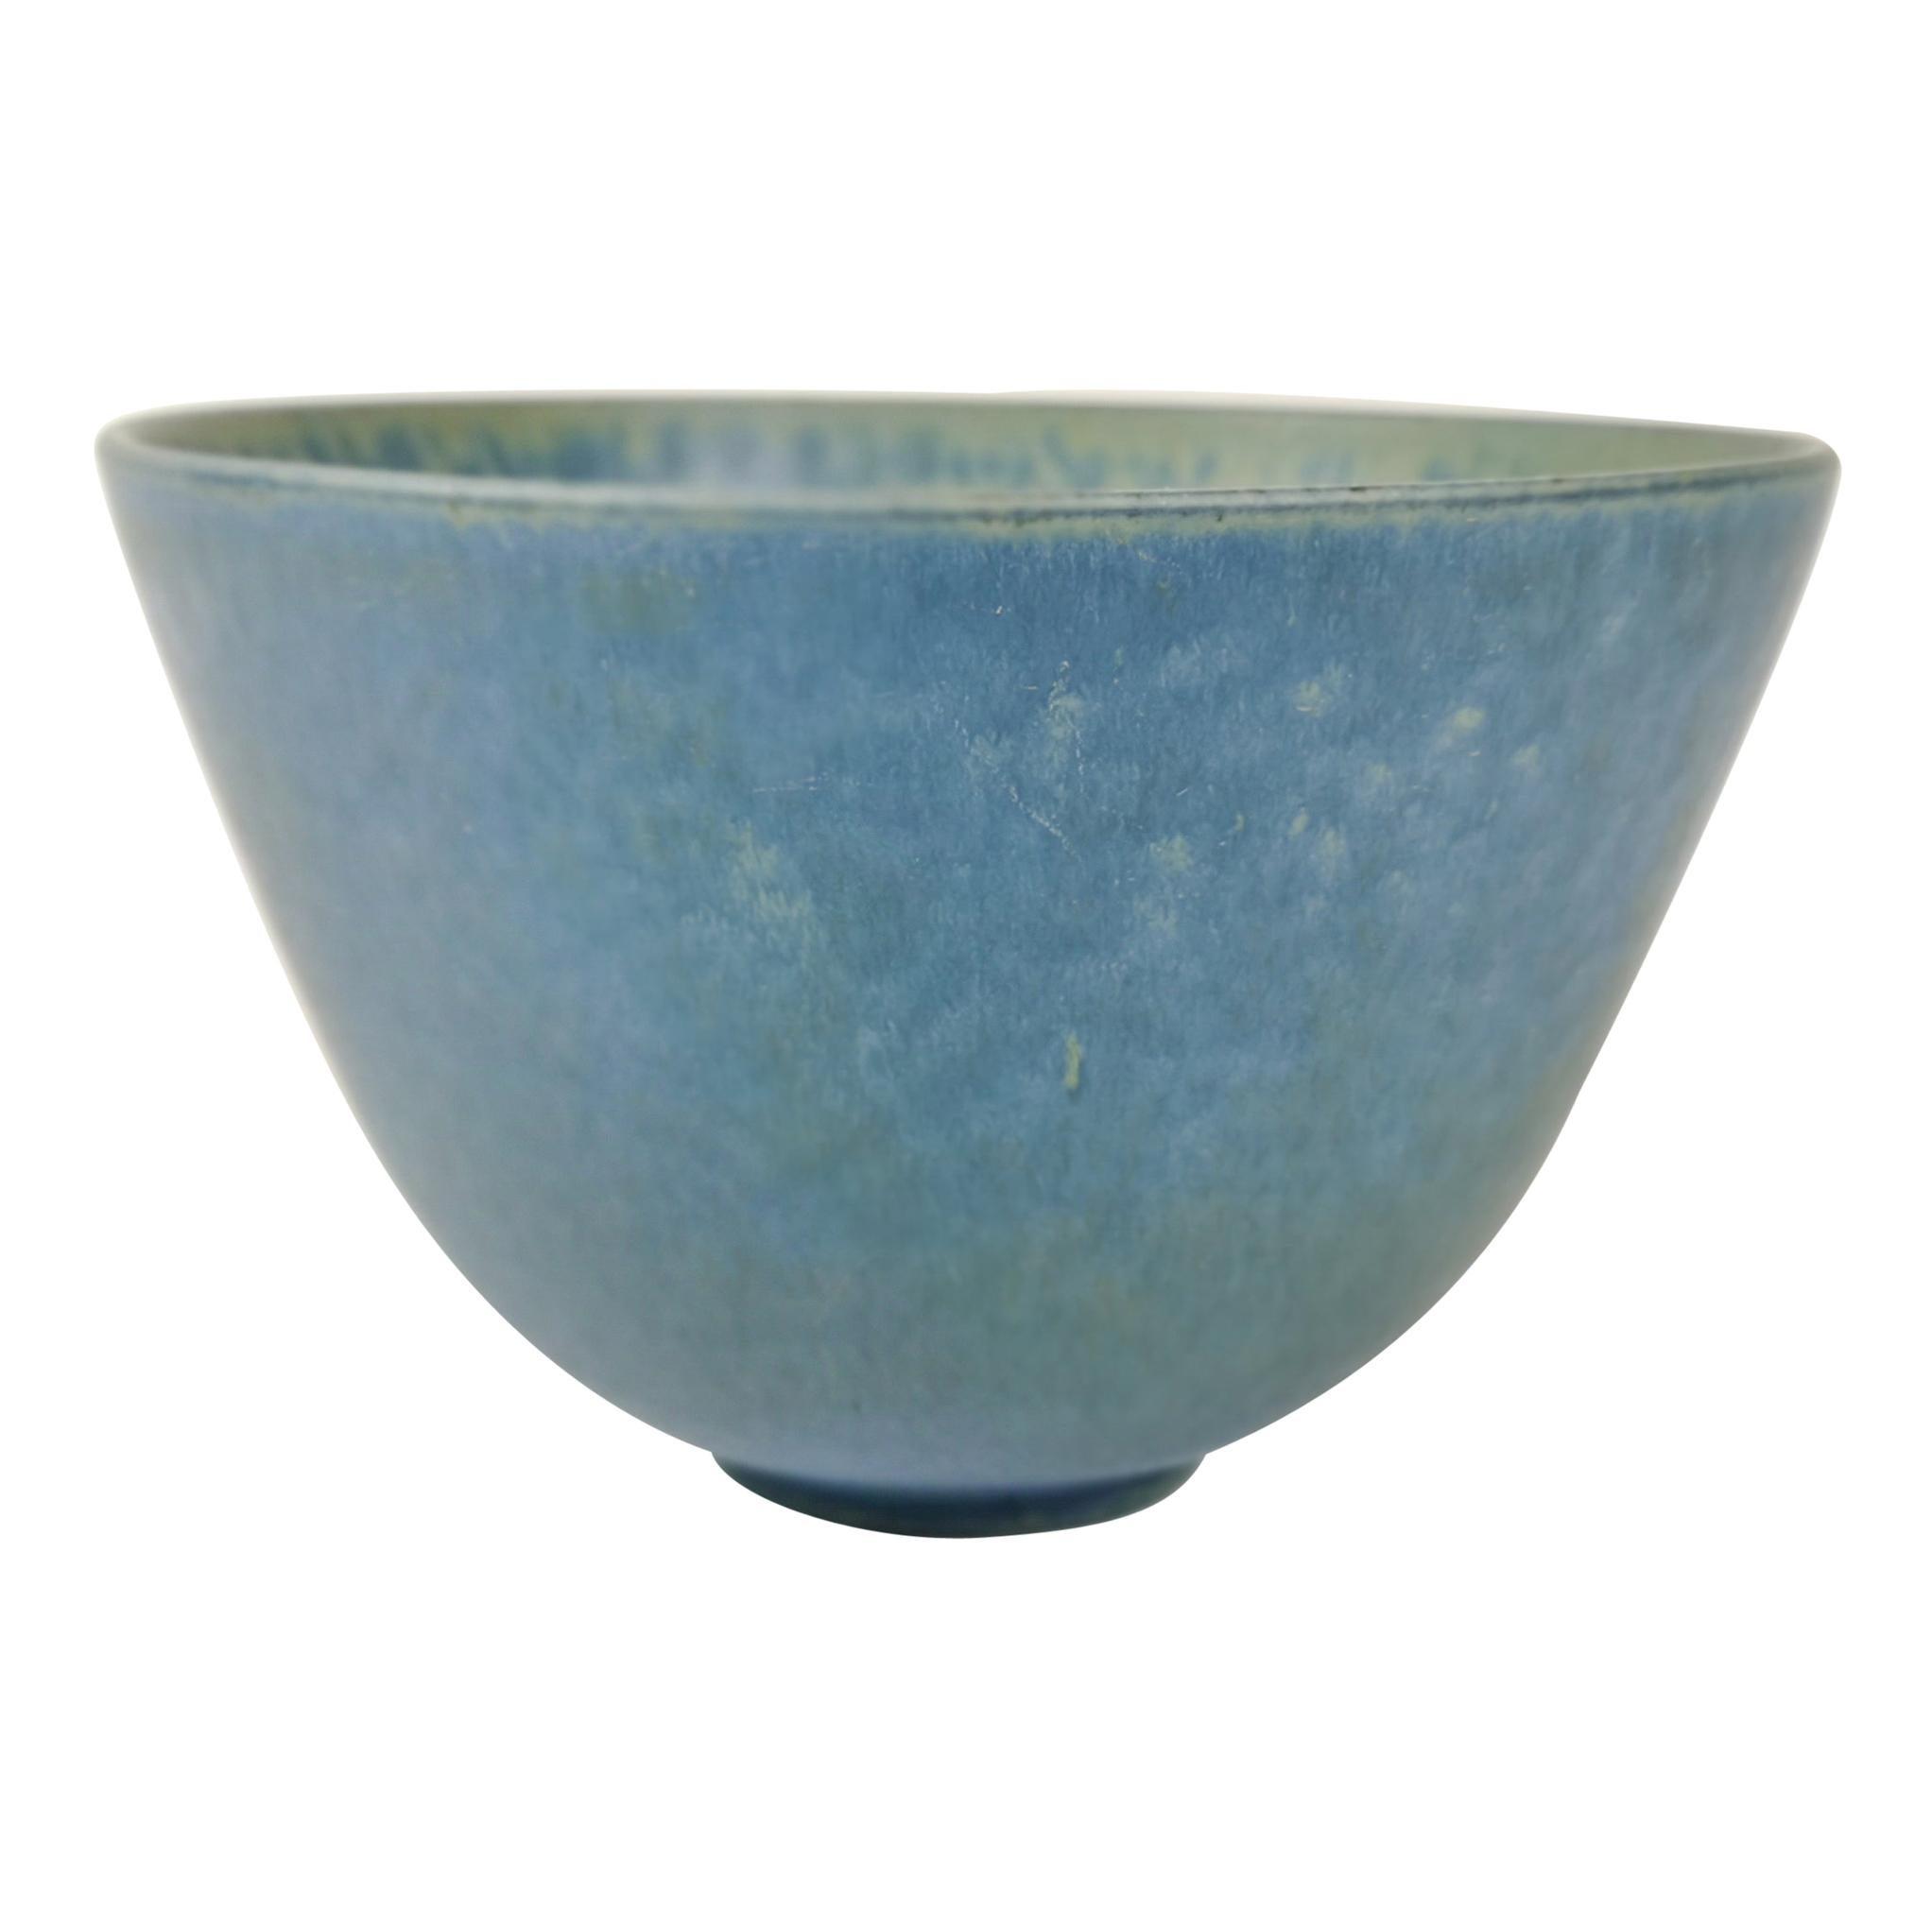 Midcentury Bowl Gunnar Nylund for Rörstrand, Sweden